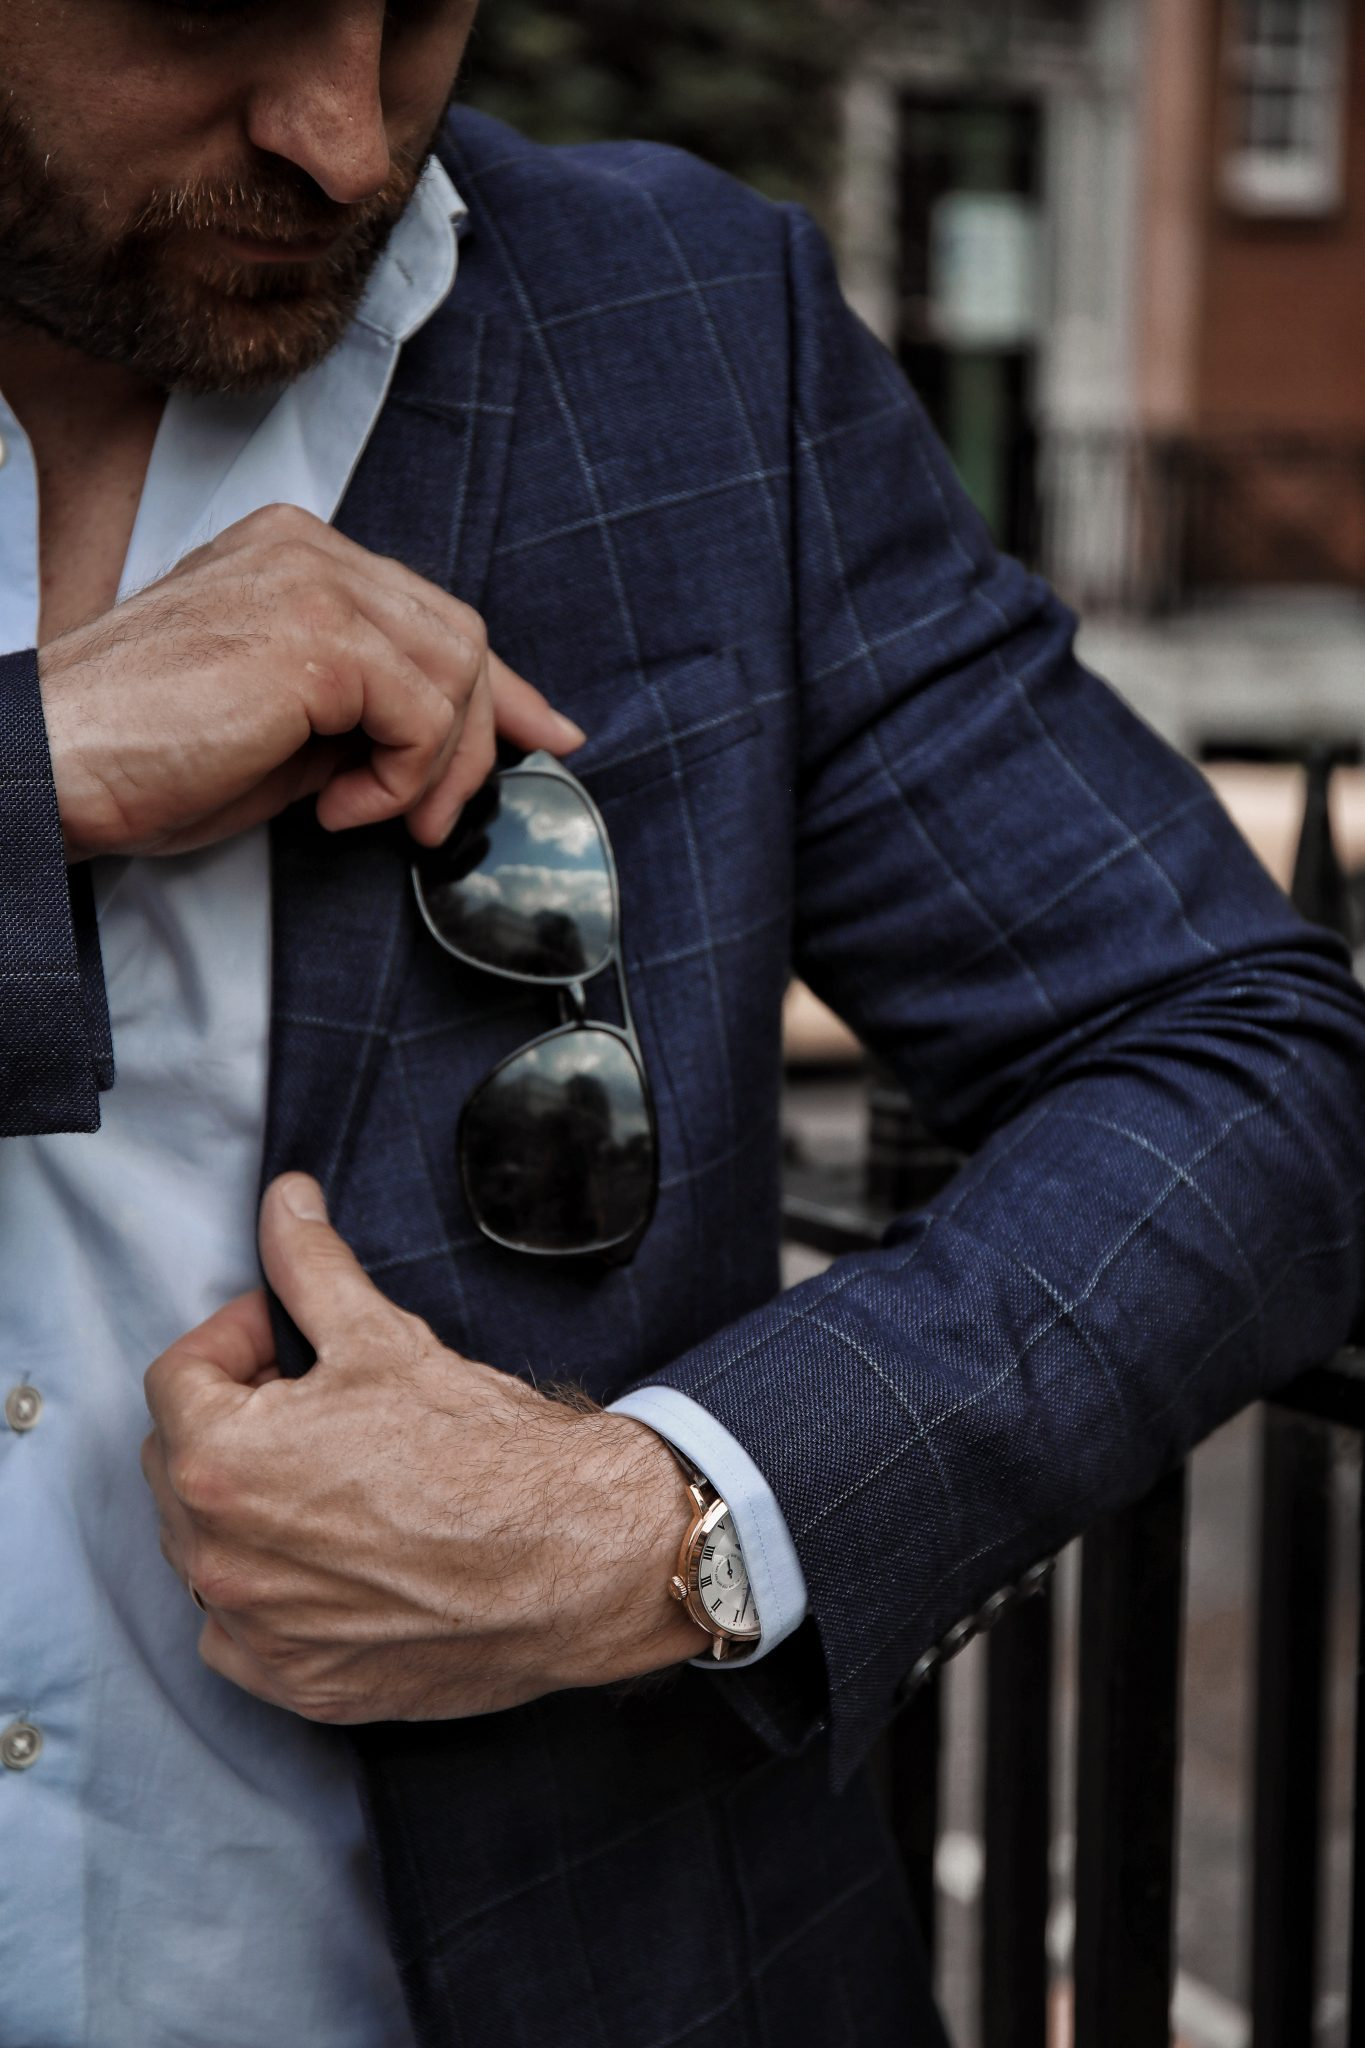 Jaeger Blazer Gucci Sunglasses Reiss Shirt Goodwin Smith Menswear Fashion Outfit